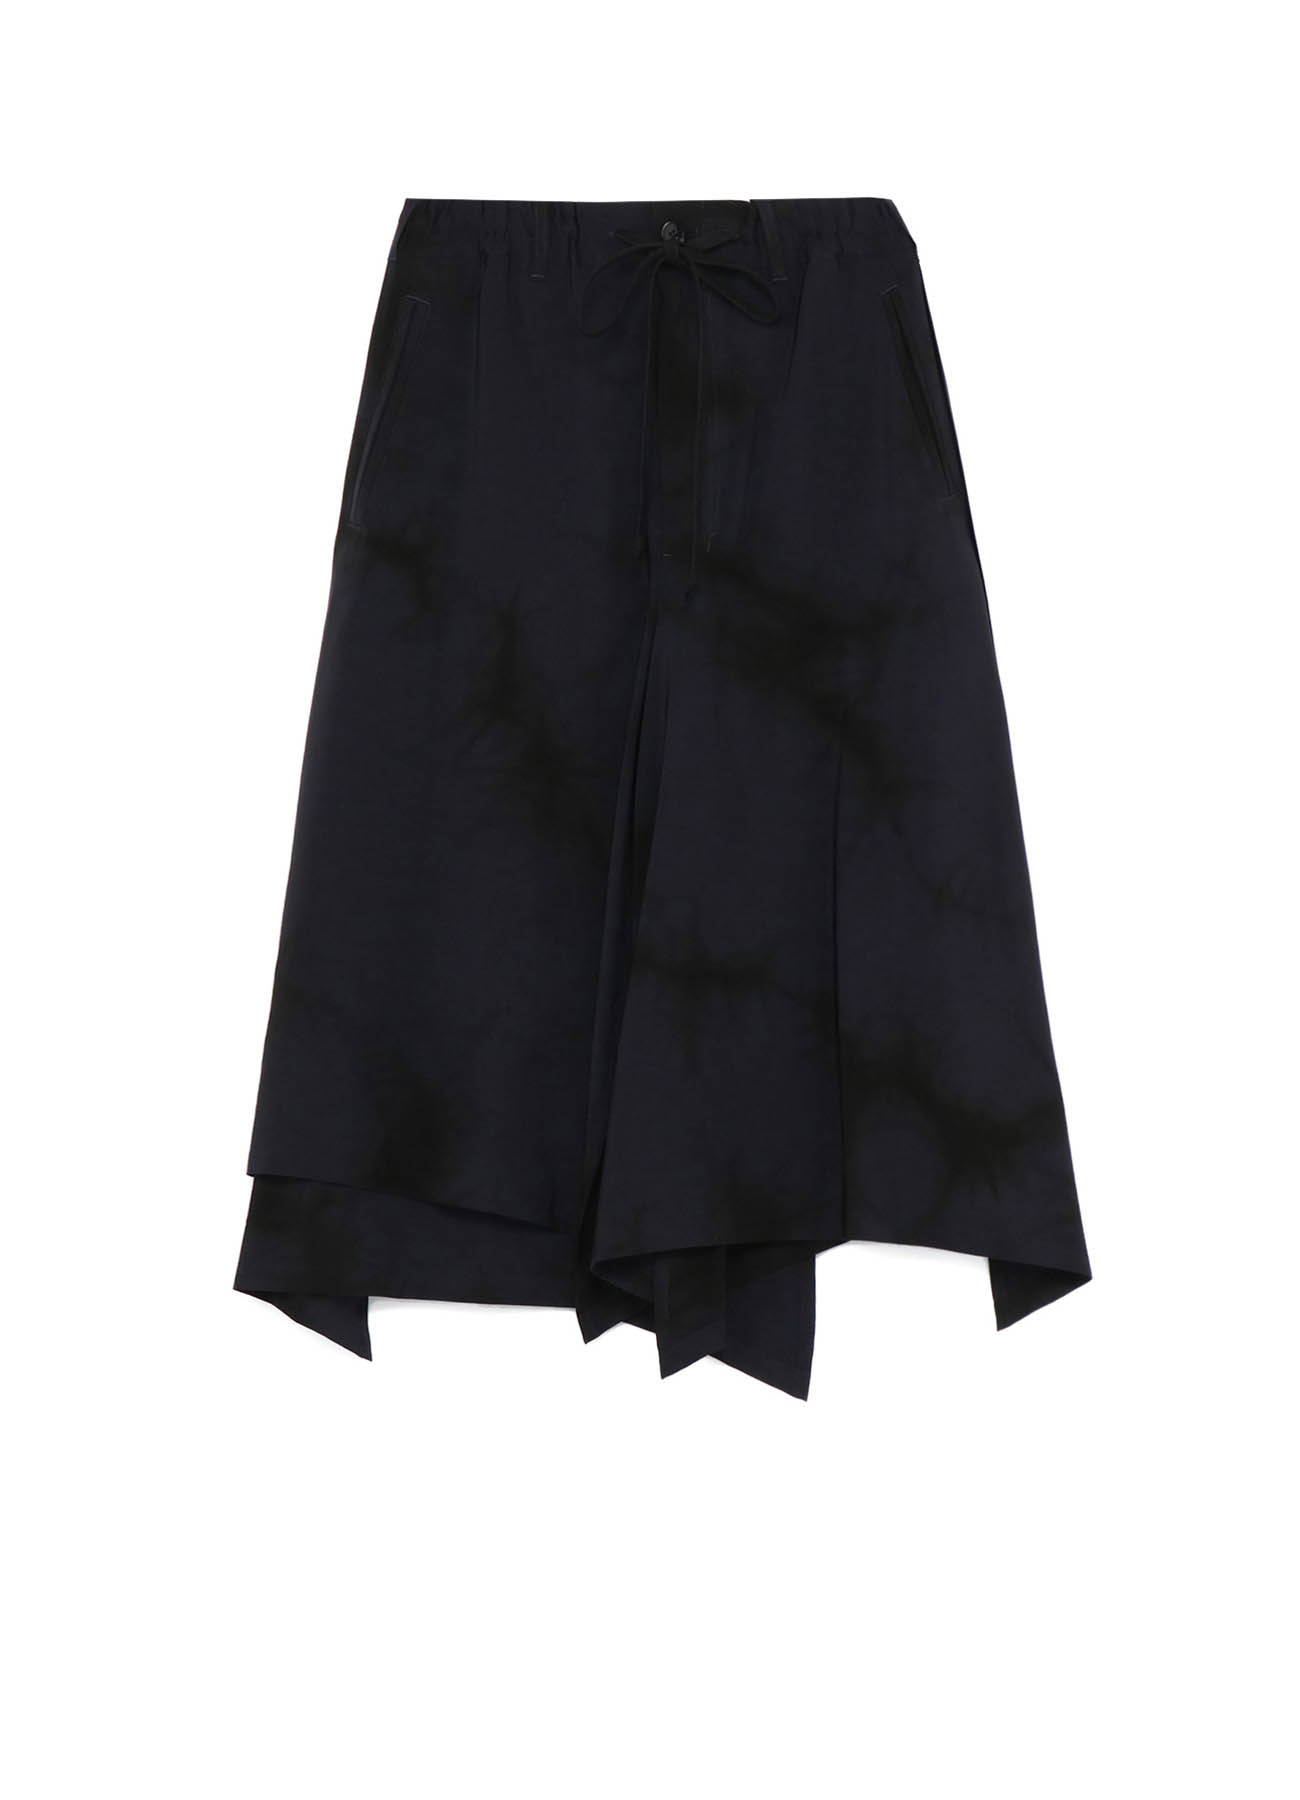 T/A Vintage Decyne Uneven Dyeing Pants Skirt